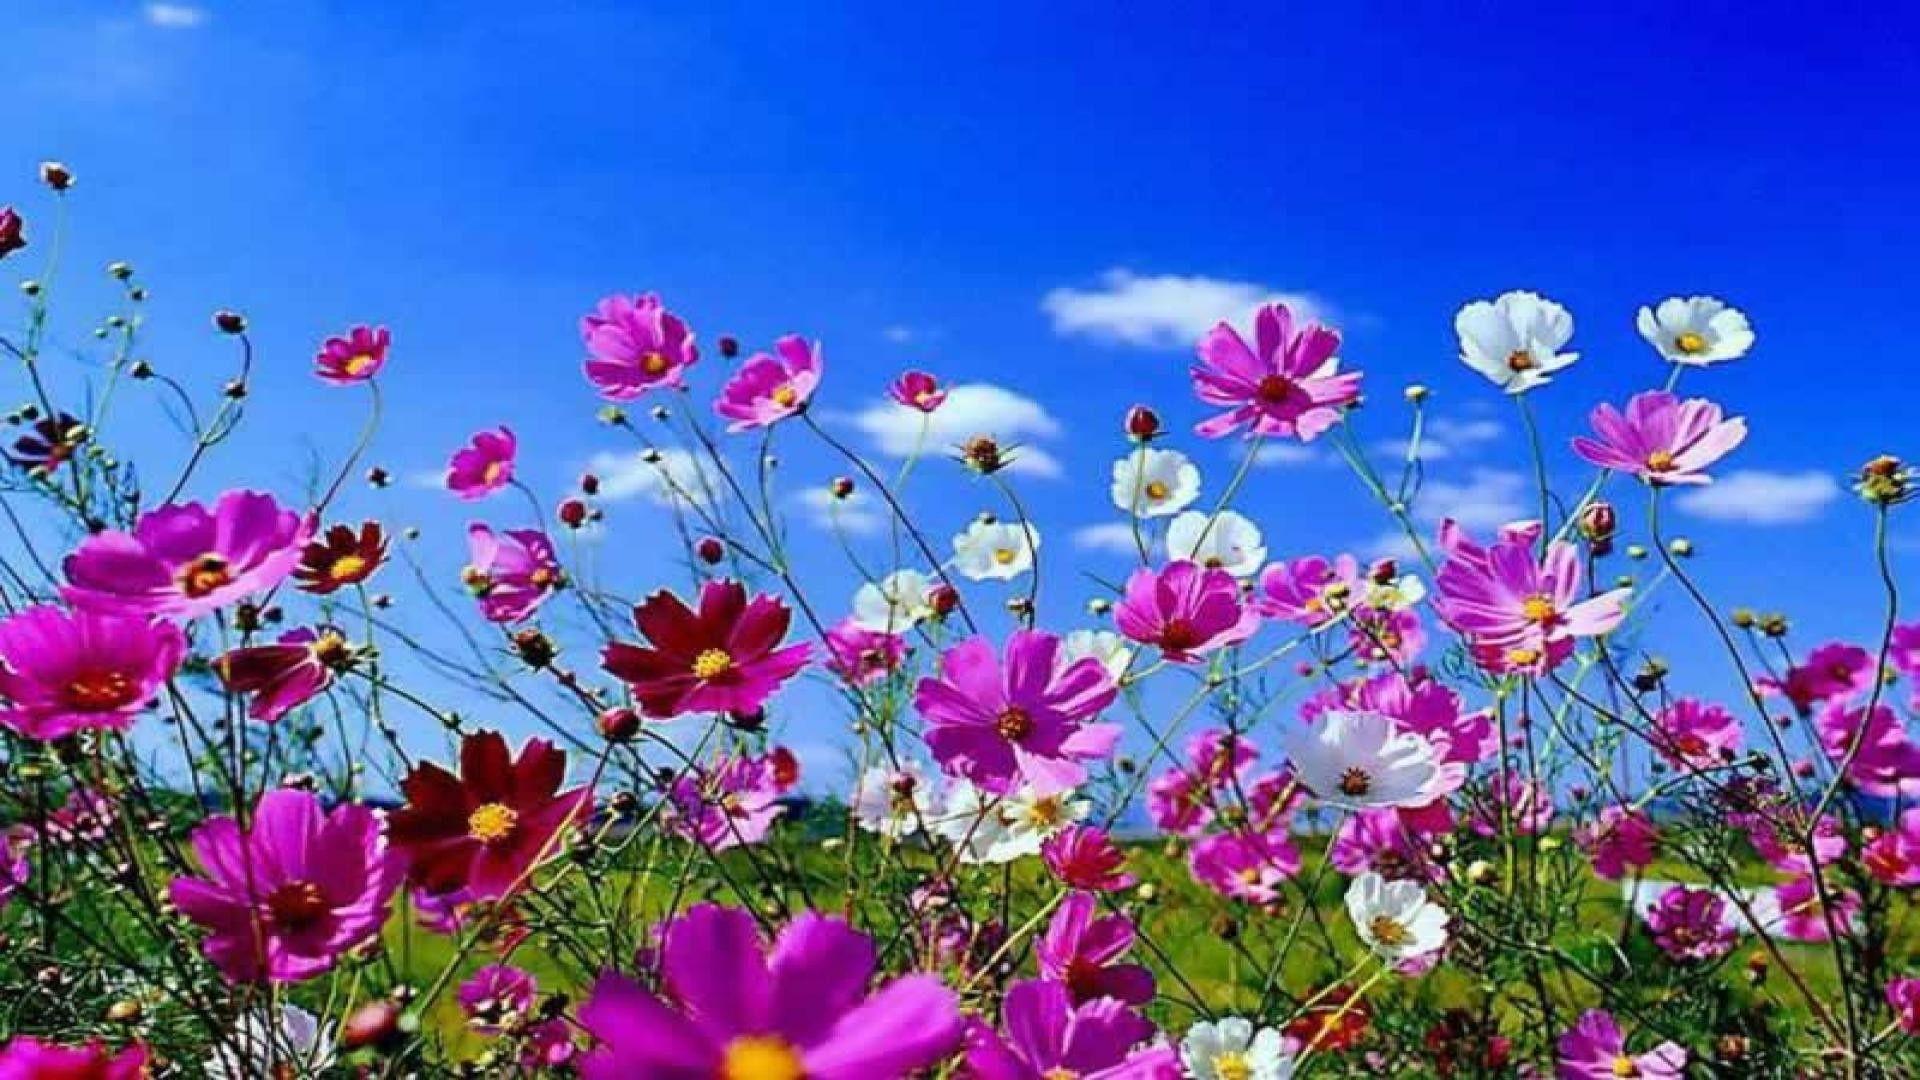 45 Spring Flowers Desktop Wallpapers   Download at WallpaperBro 1920x1080